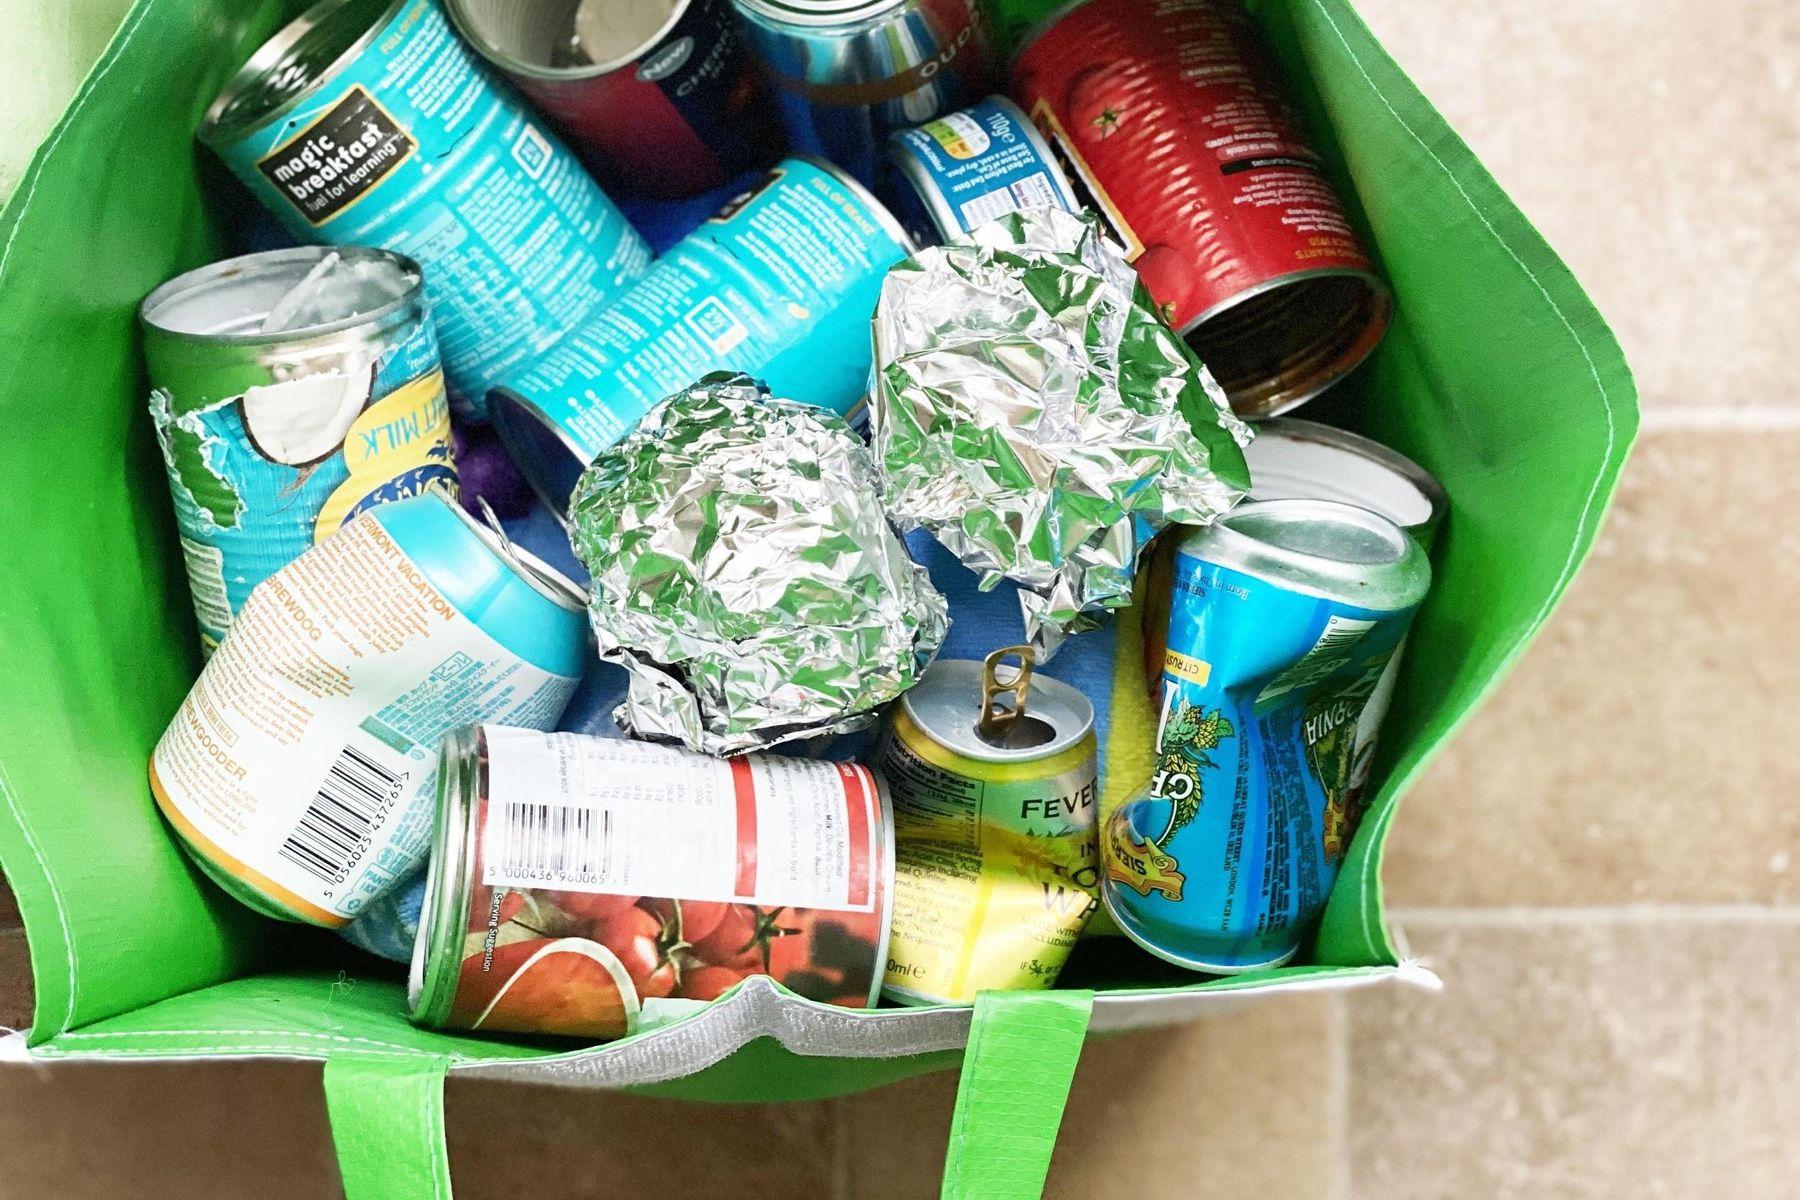 saco plástico contendo latas vazias